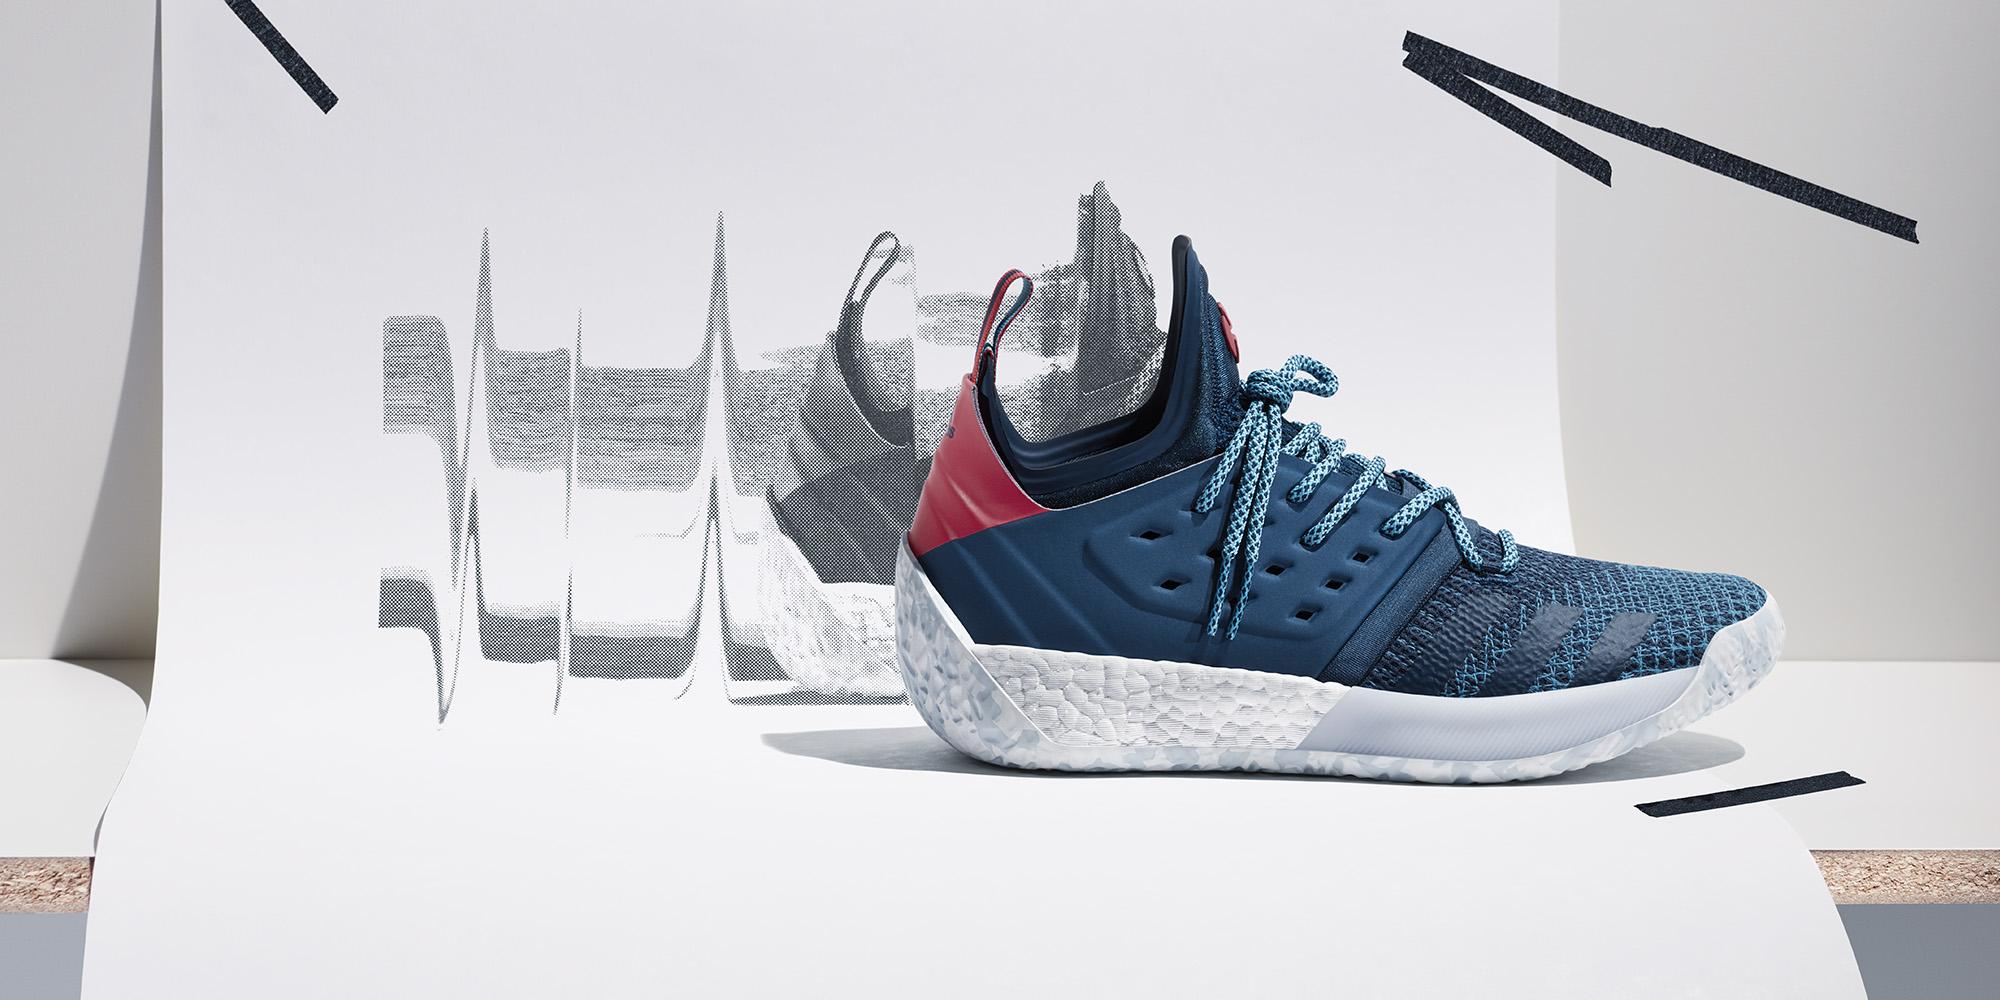 0b590593f26 adidas harden vol 2 step back 1 - WearTesters